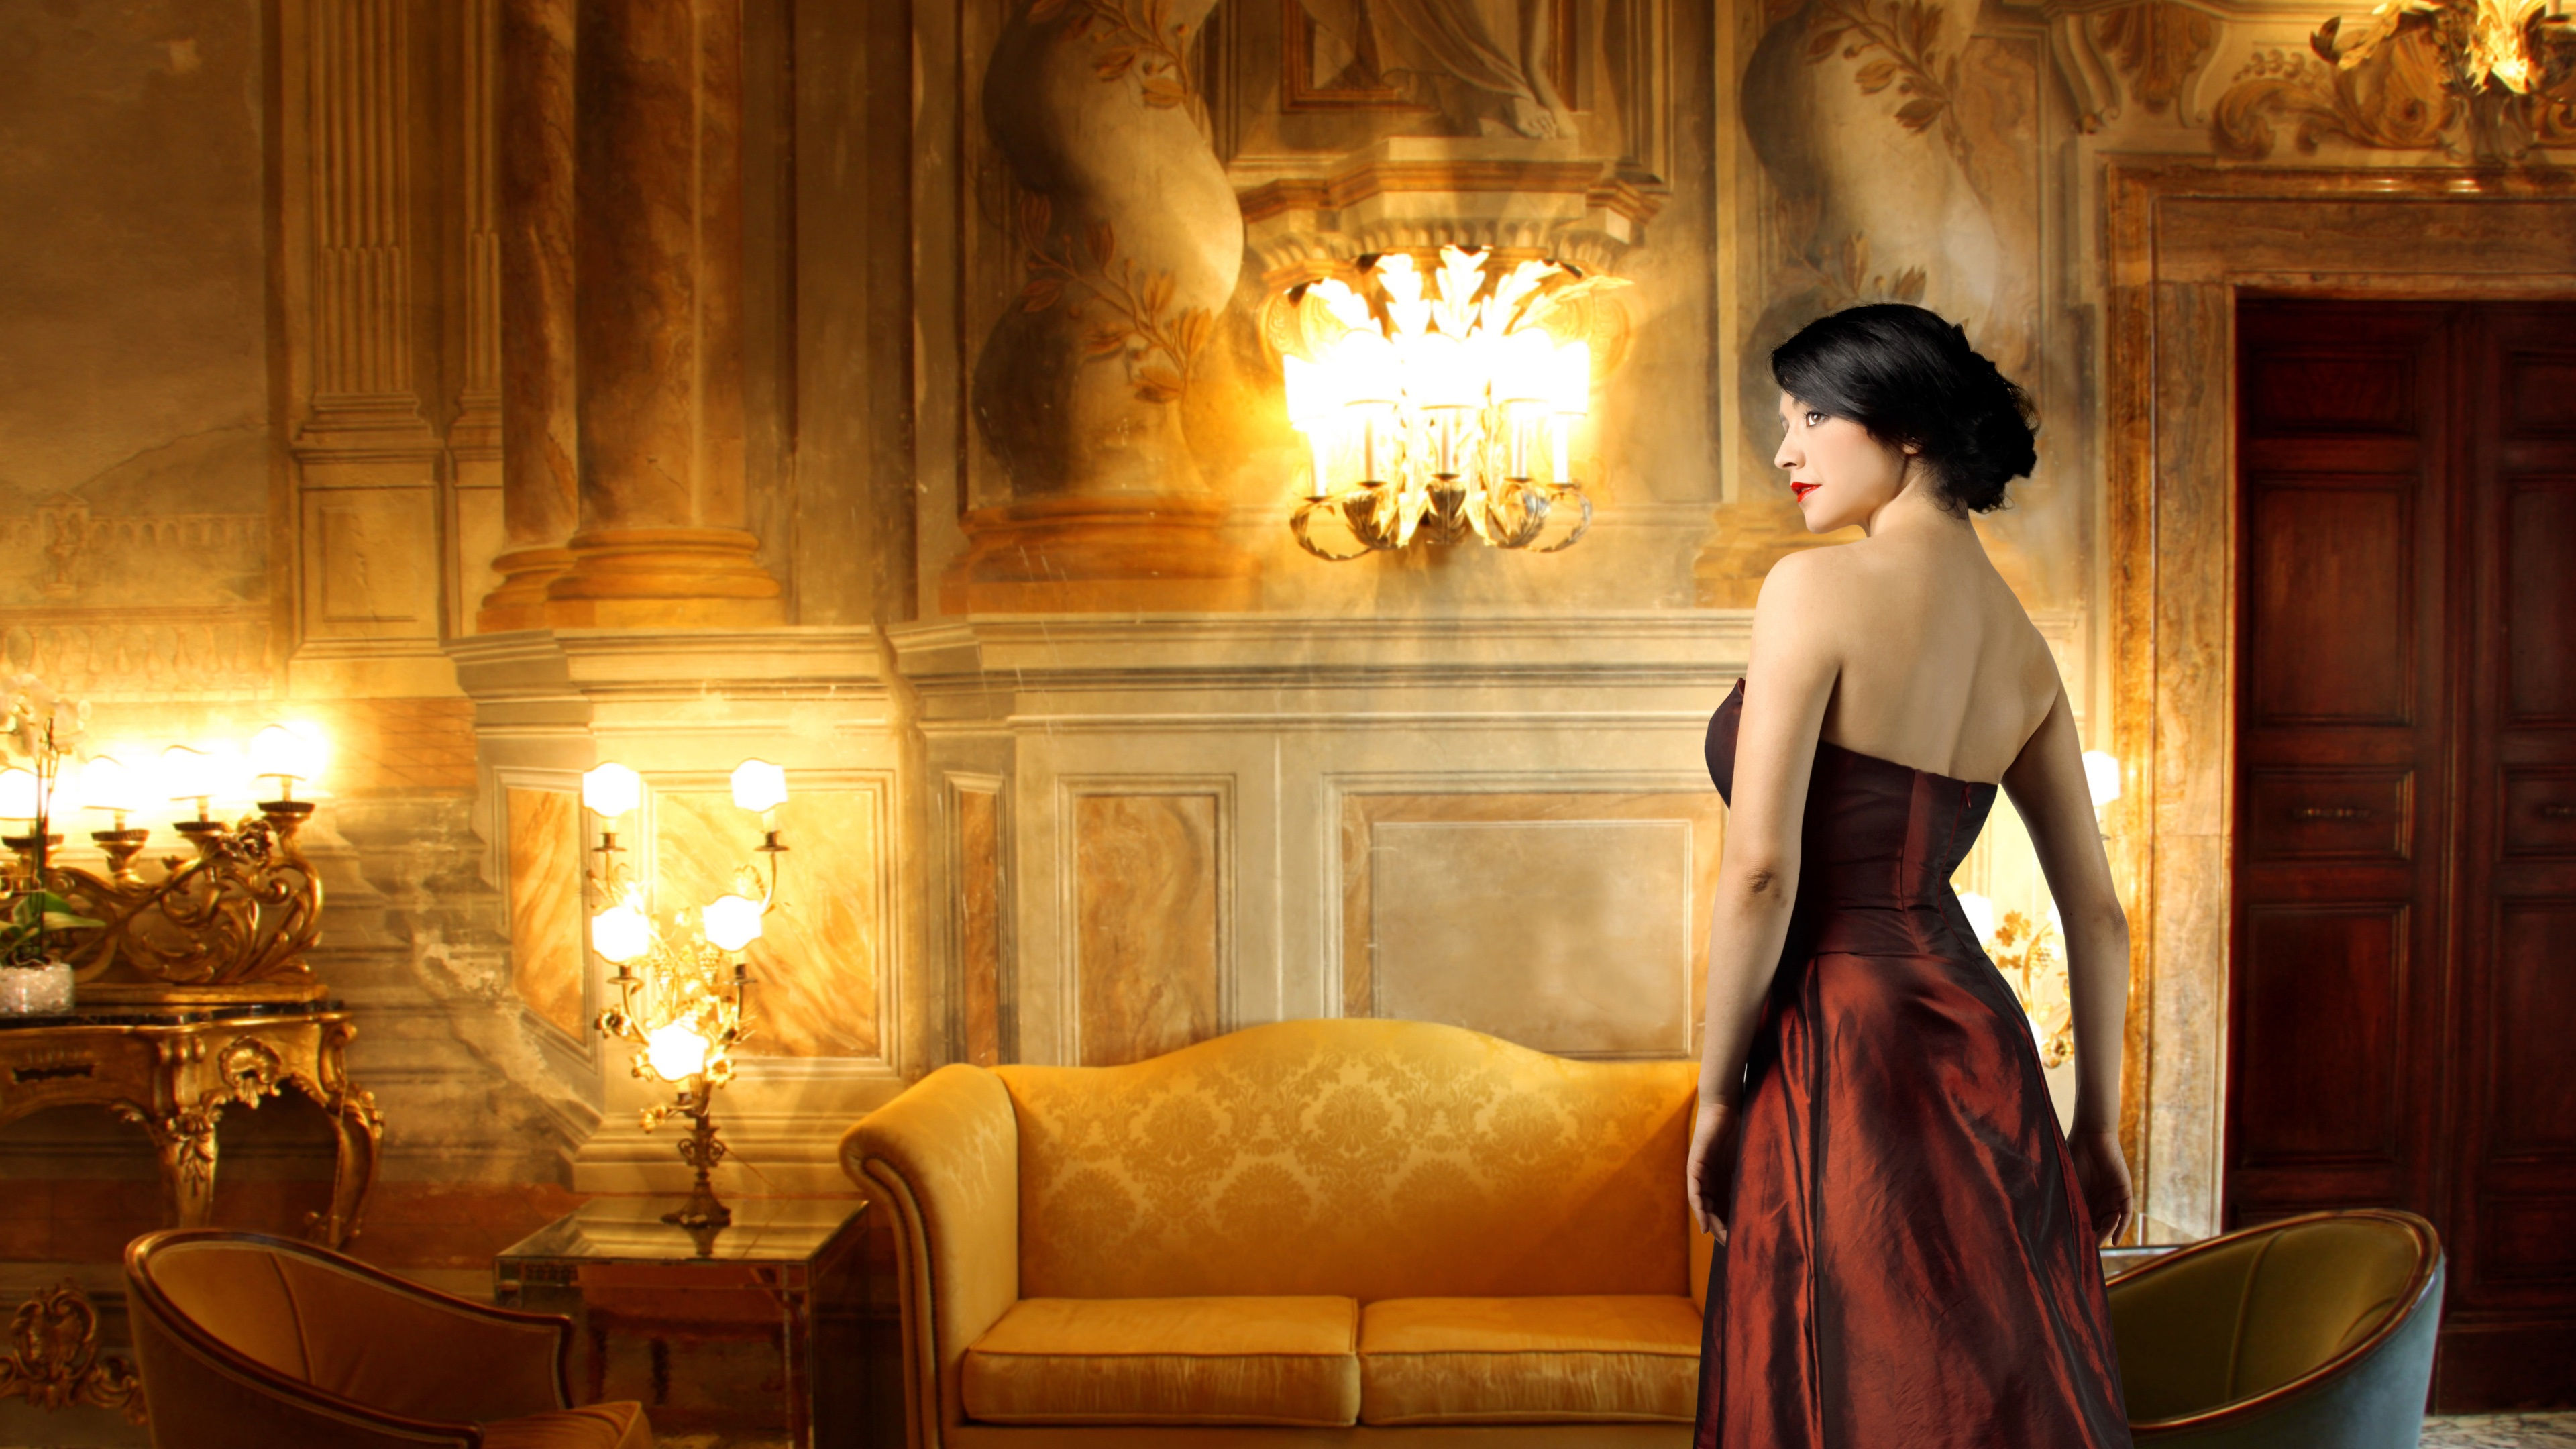 Wallpaper Elegant Girl Red Clothing Furniture Lights